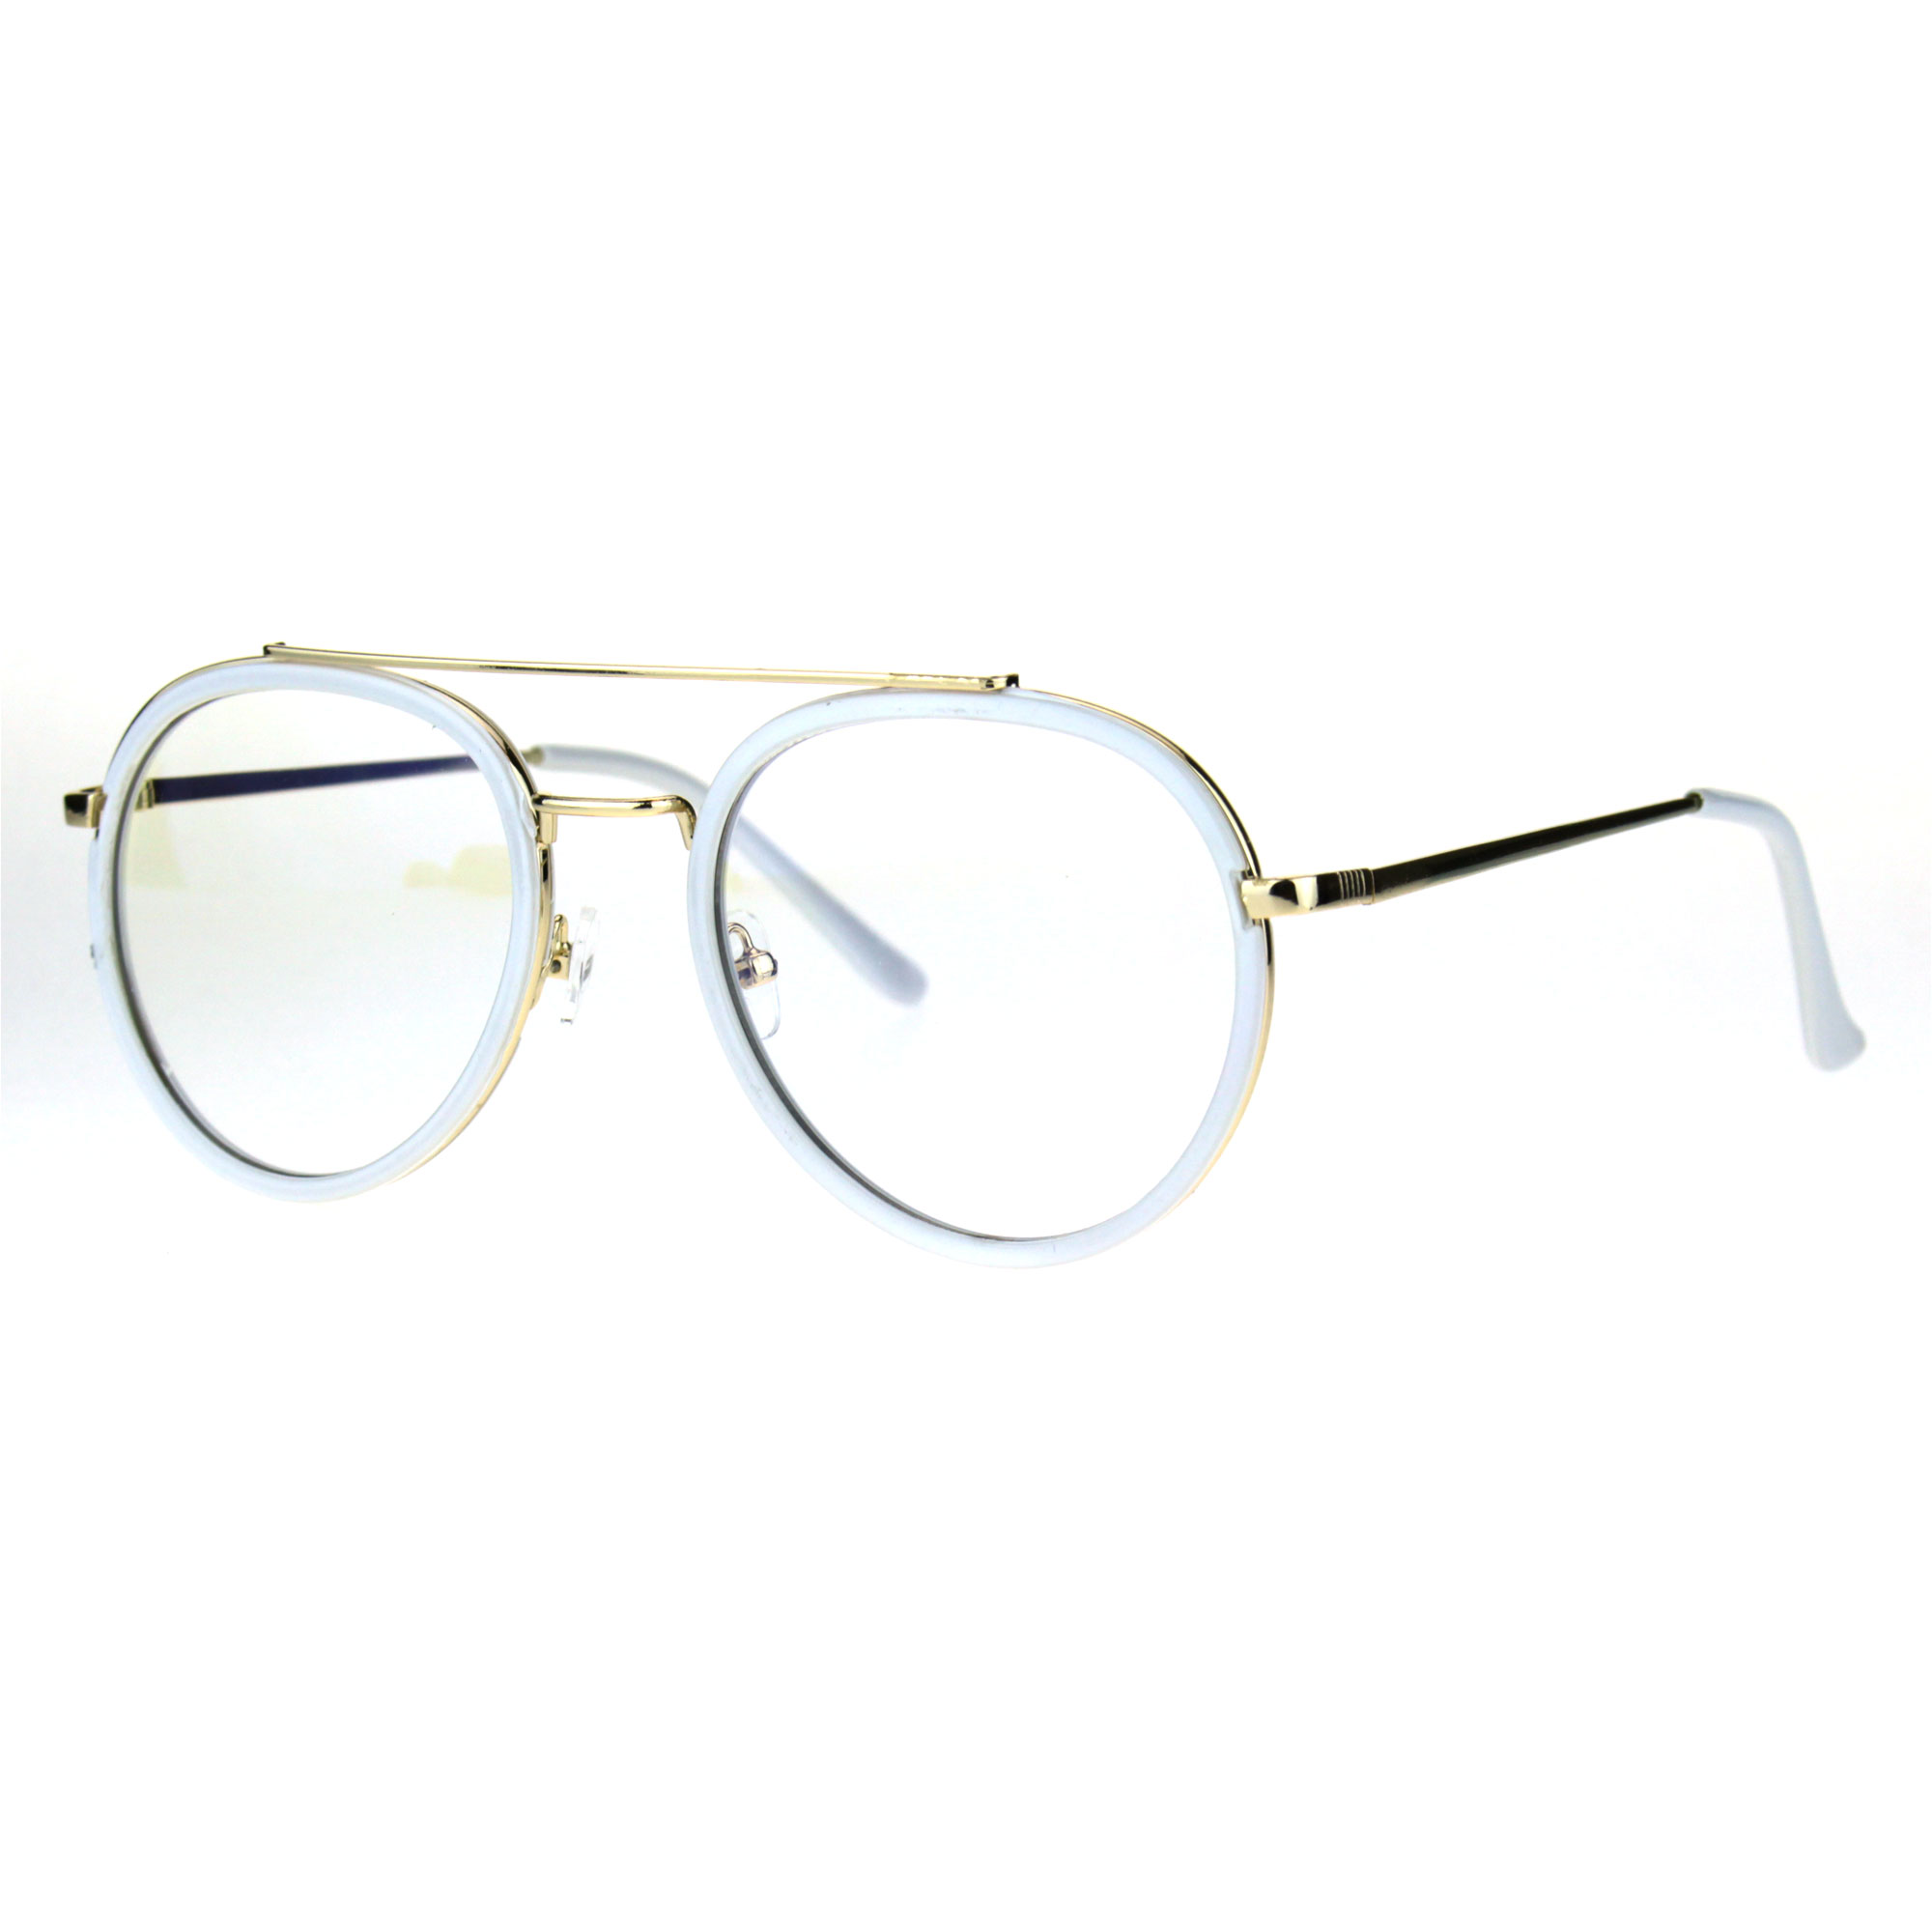 21486a19586 Retro Trend Plastic Metal Double Rim 90s Aviator Clear Lens Eye ...